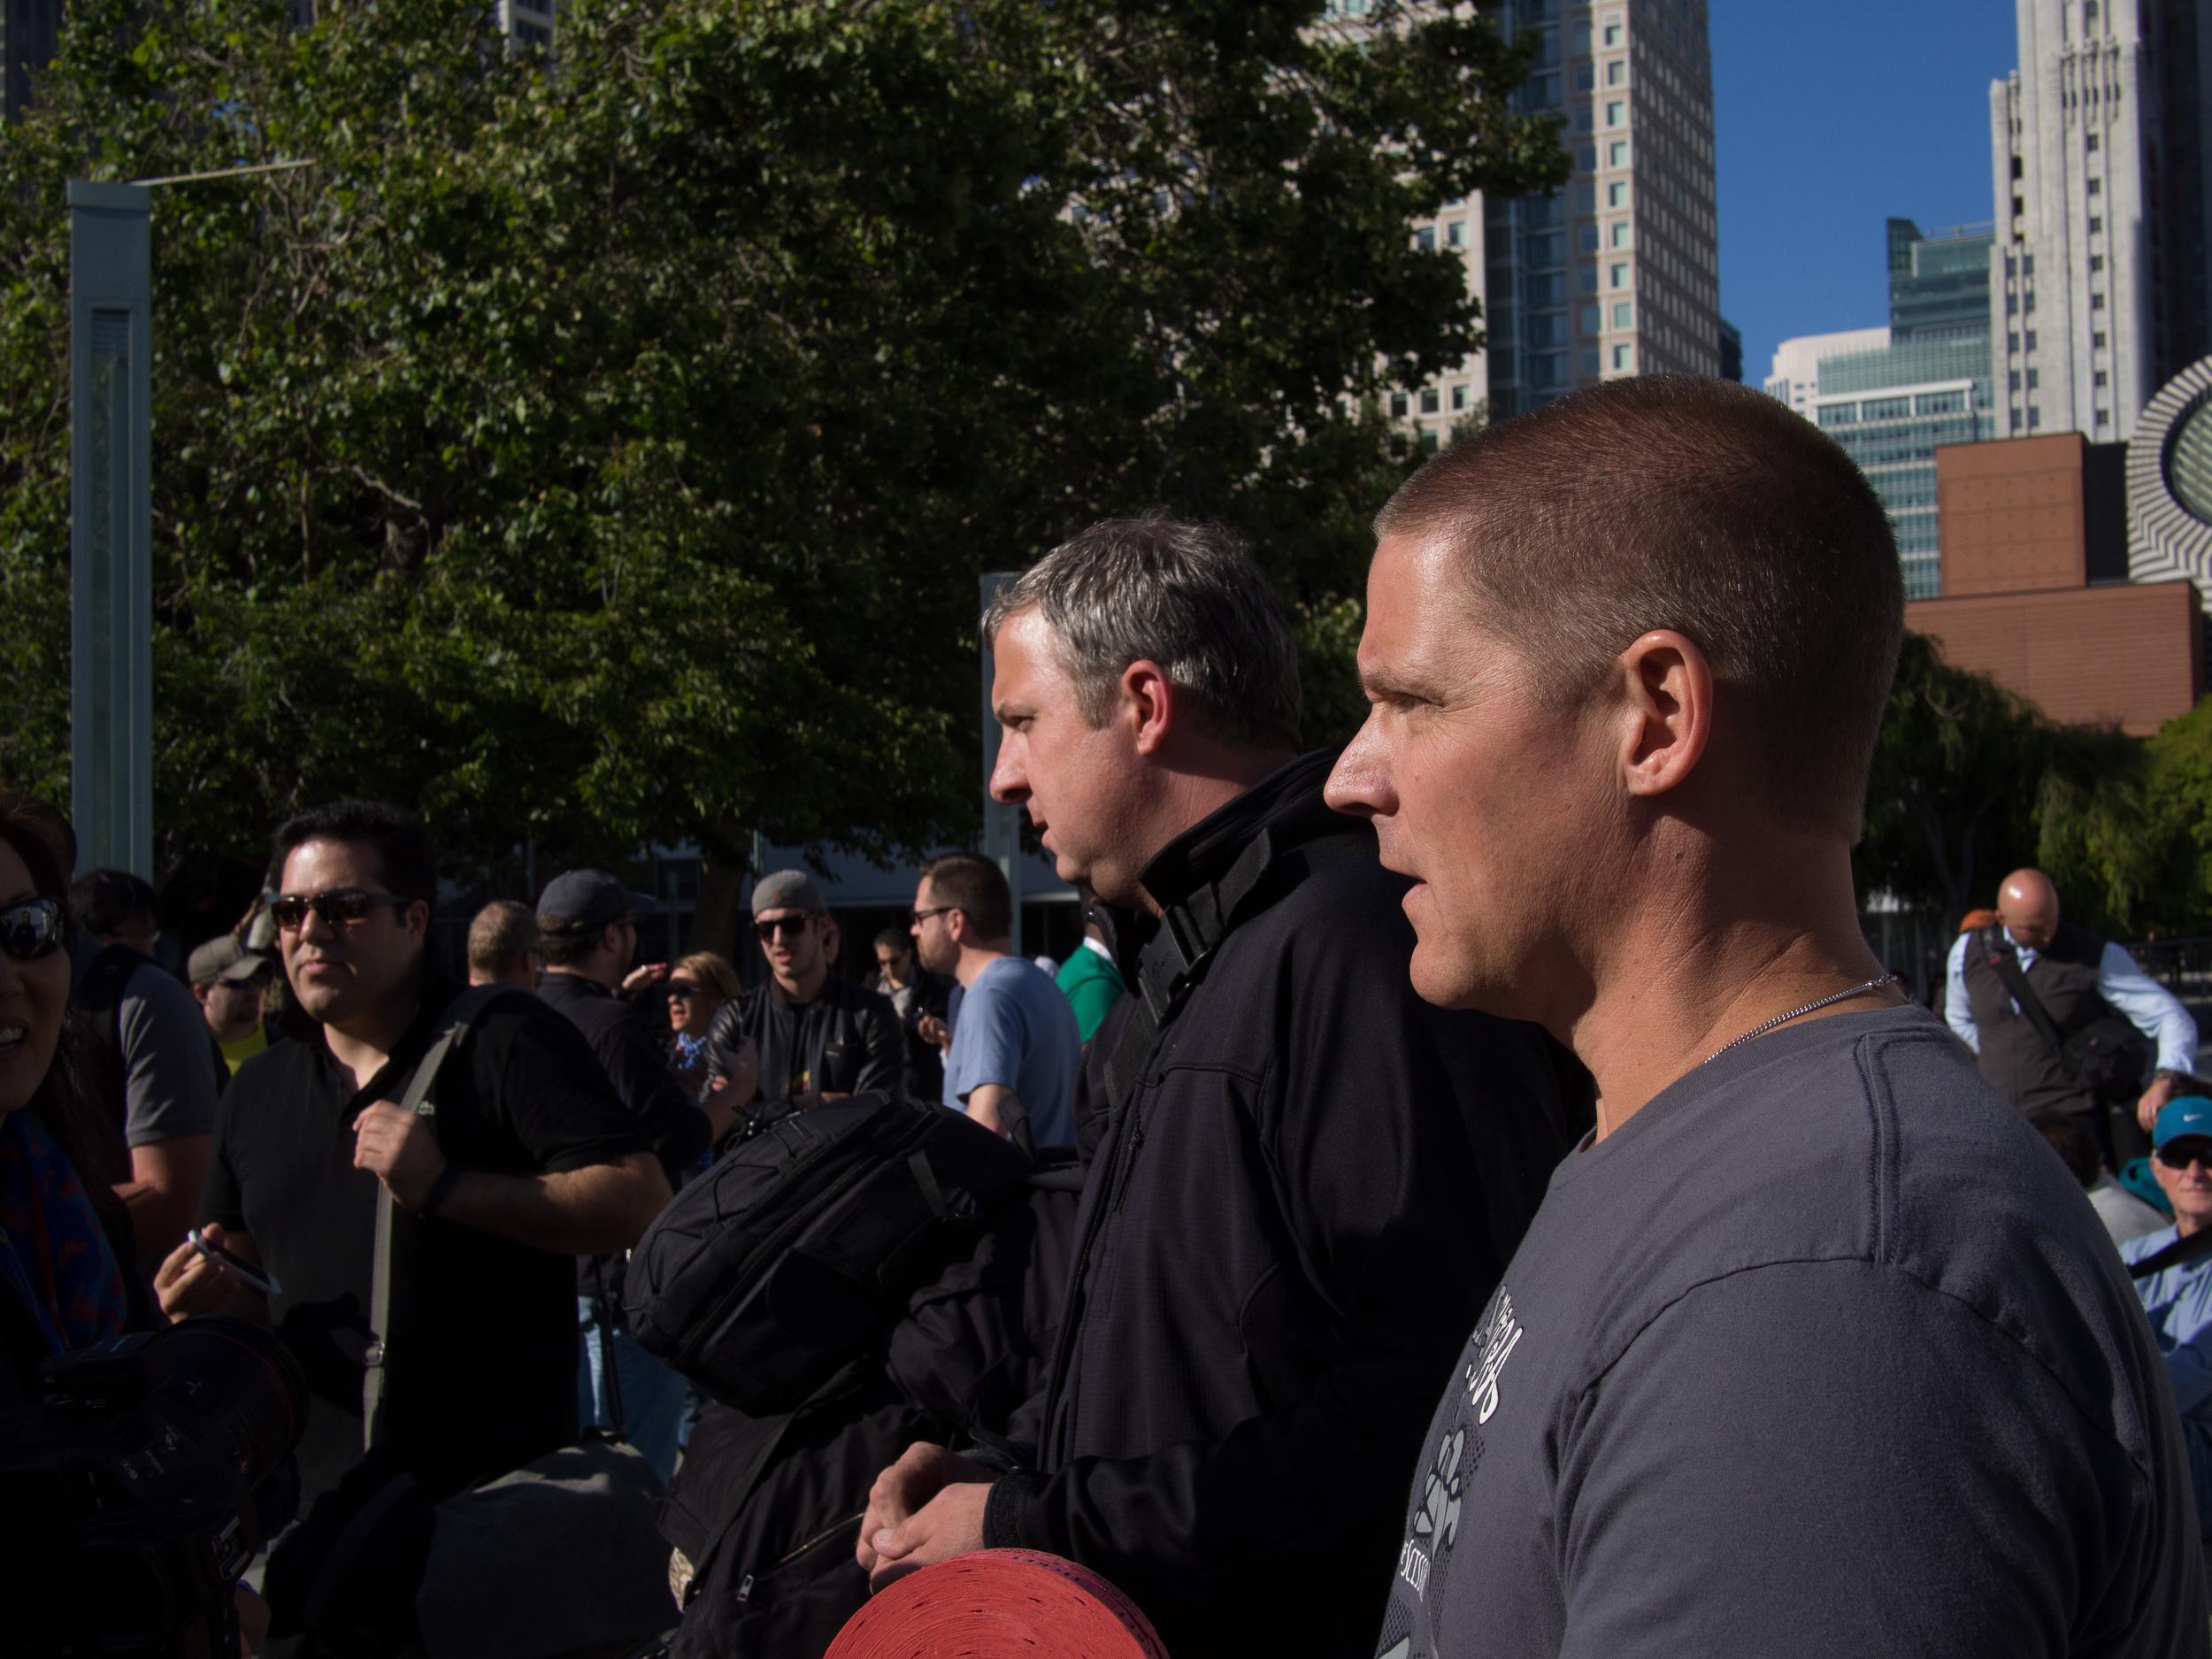 2013 05 14 SF Photowalk with Trey Ratcliff and Thomas Hawk-3 (3 of 12).jpg